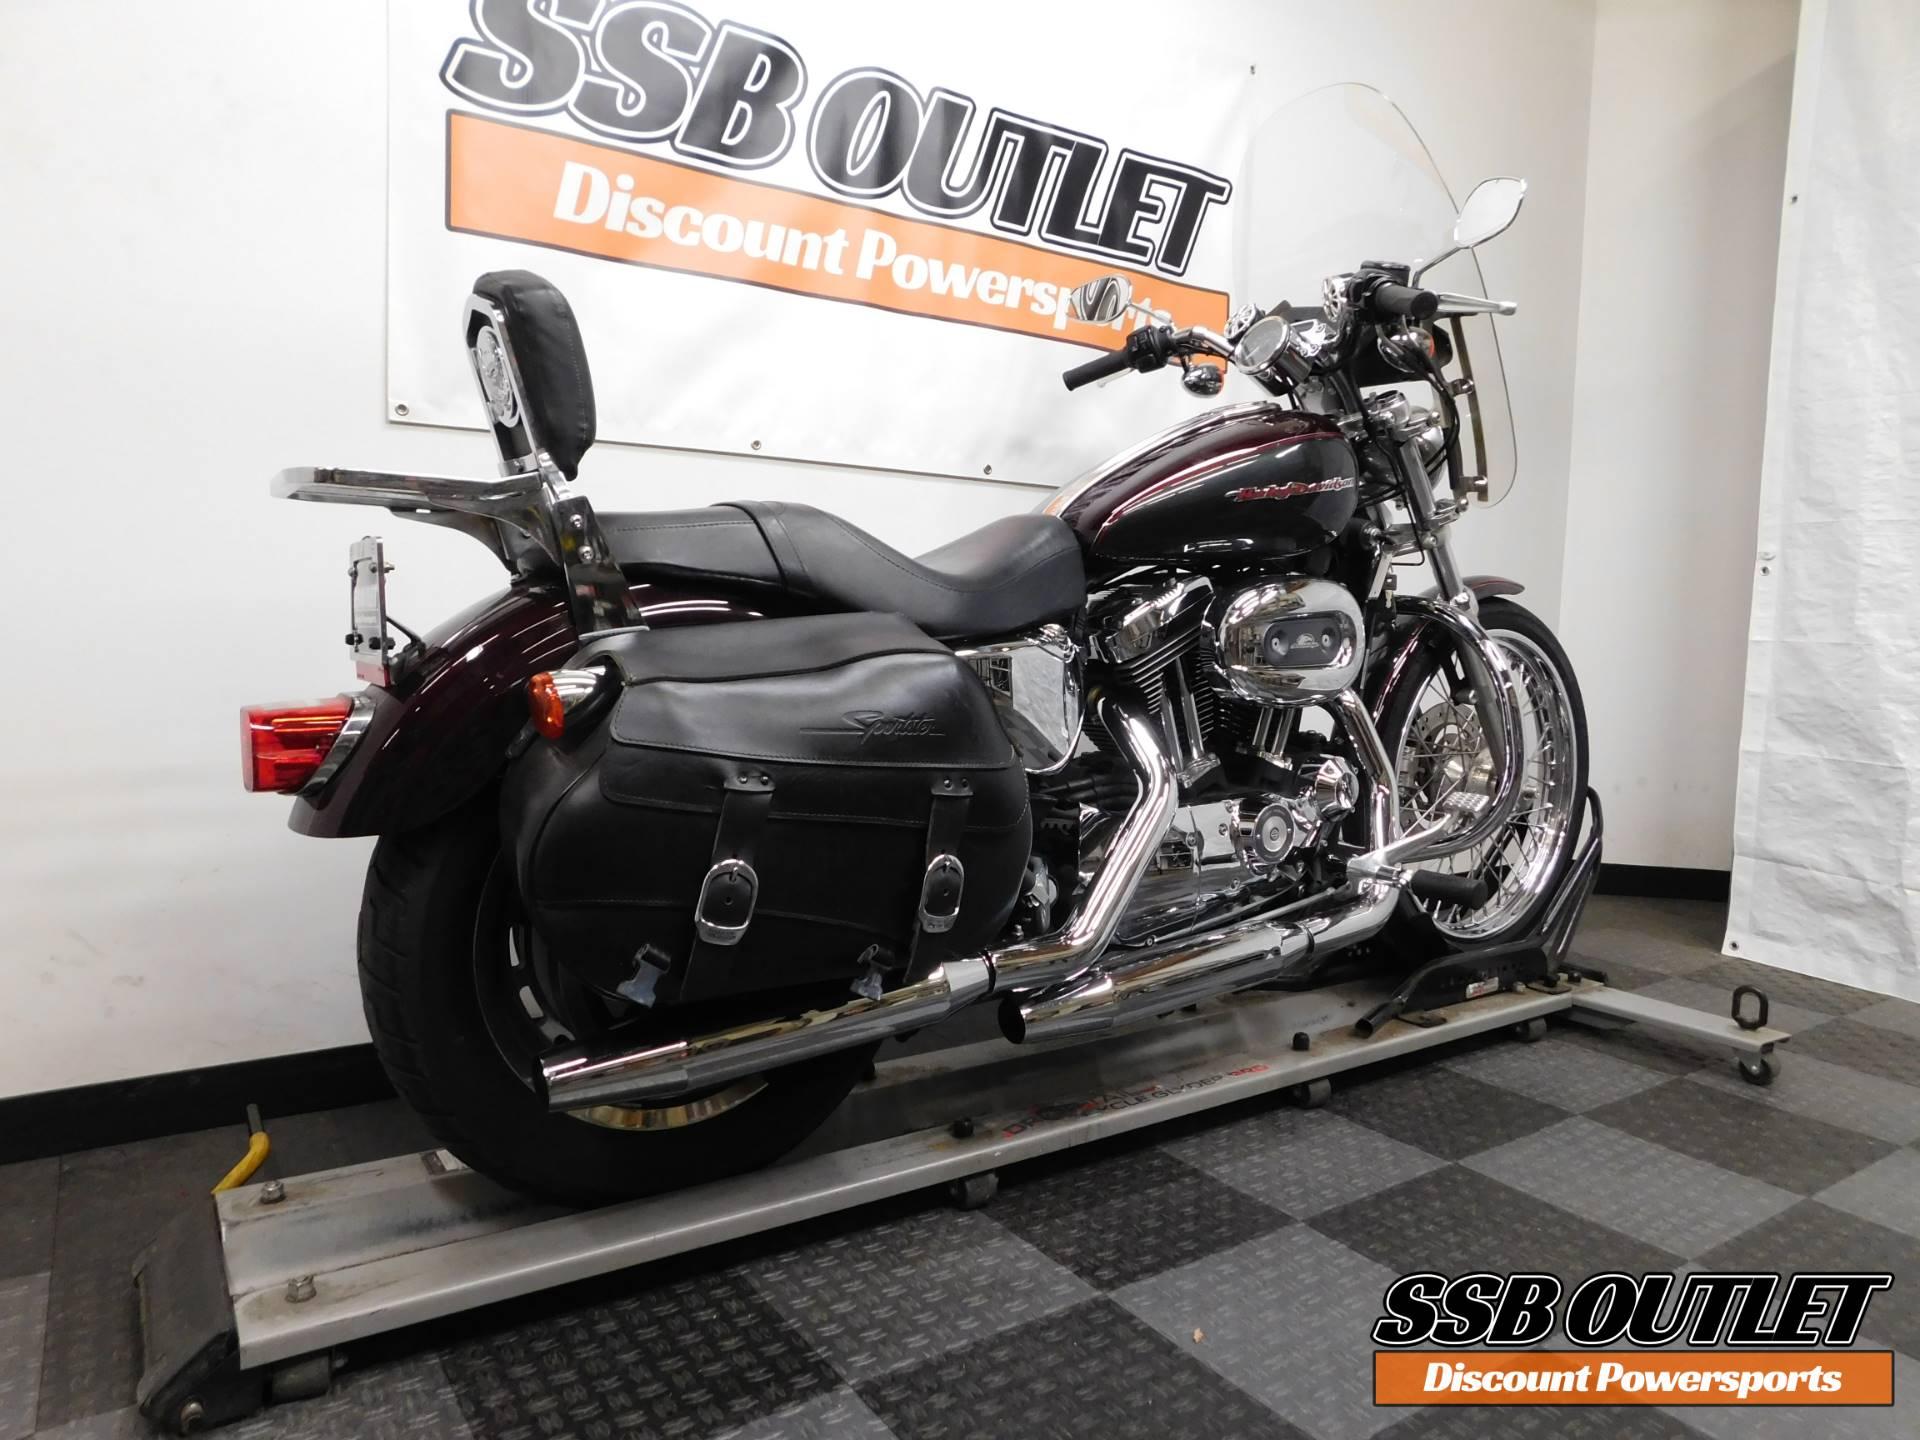 2006 Harley-Davidson Sportster 1200 Custom 6